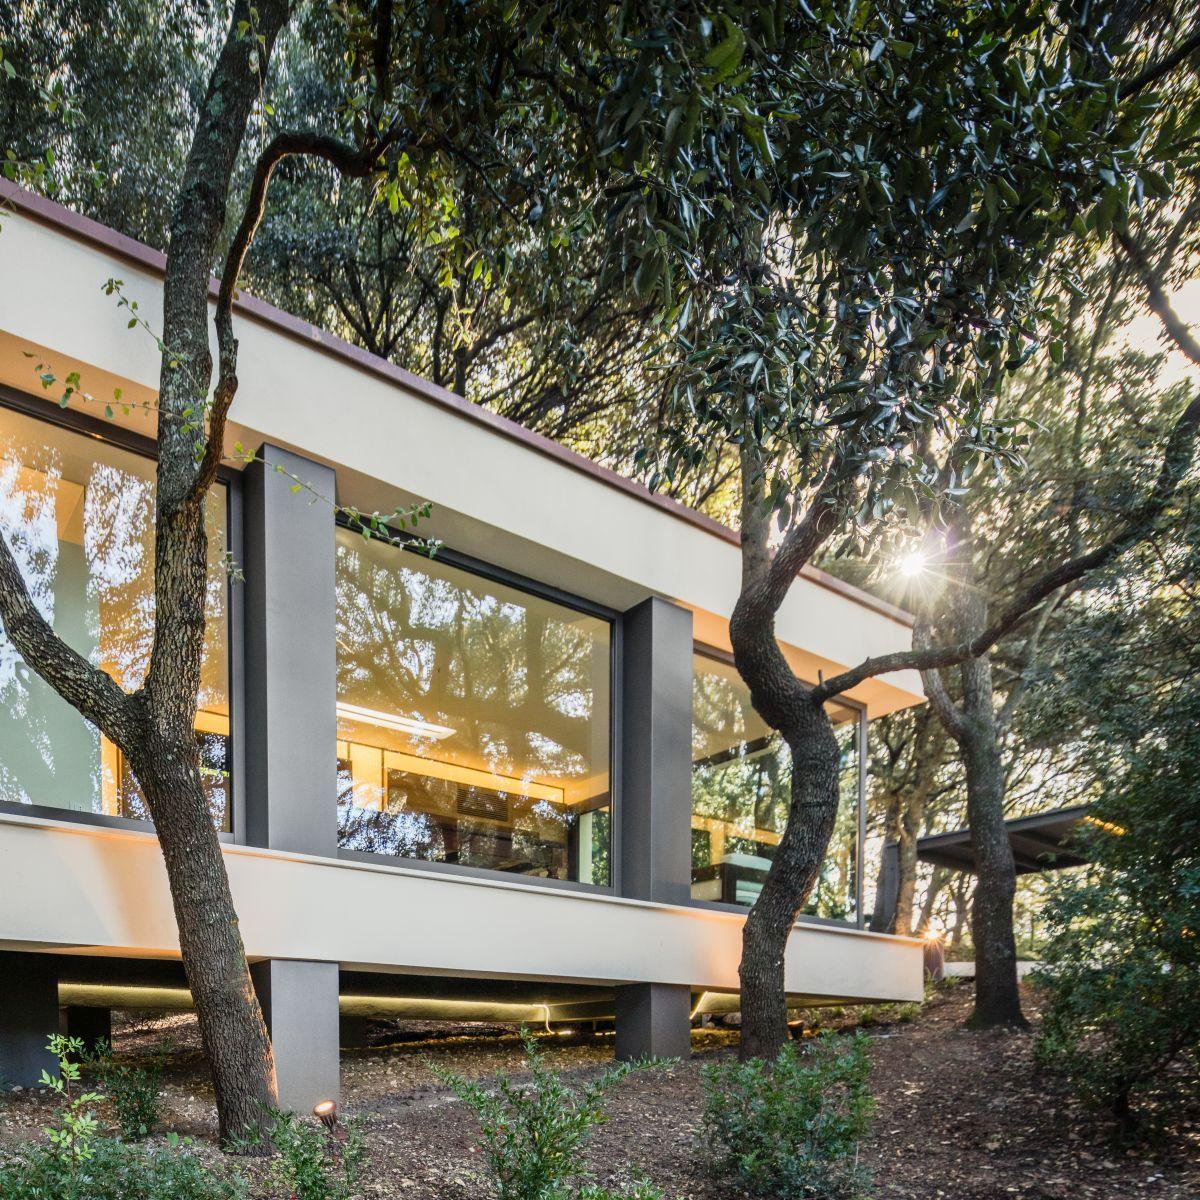 Casa nel Bosco suspended on pillars